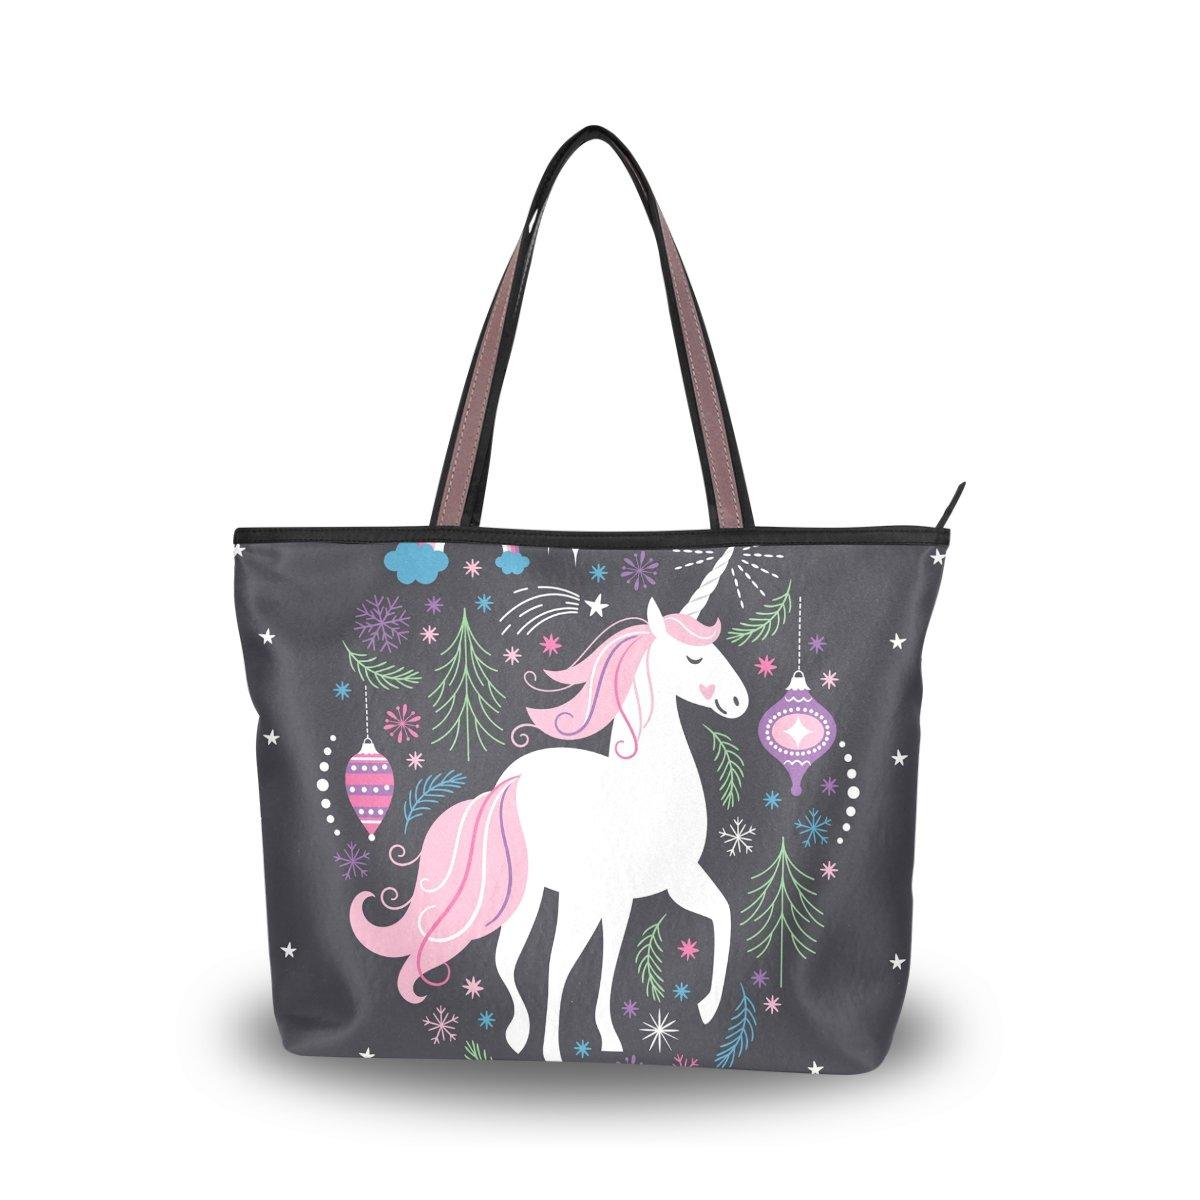 JSTEL Women Large Tote Top Handle Shoulder Bags Hristmas Unicorn Patern Ladies Handbag